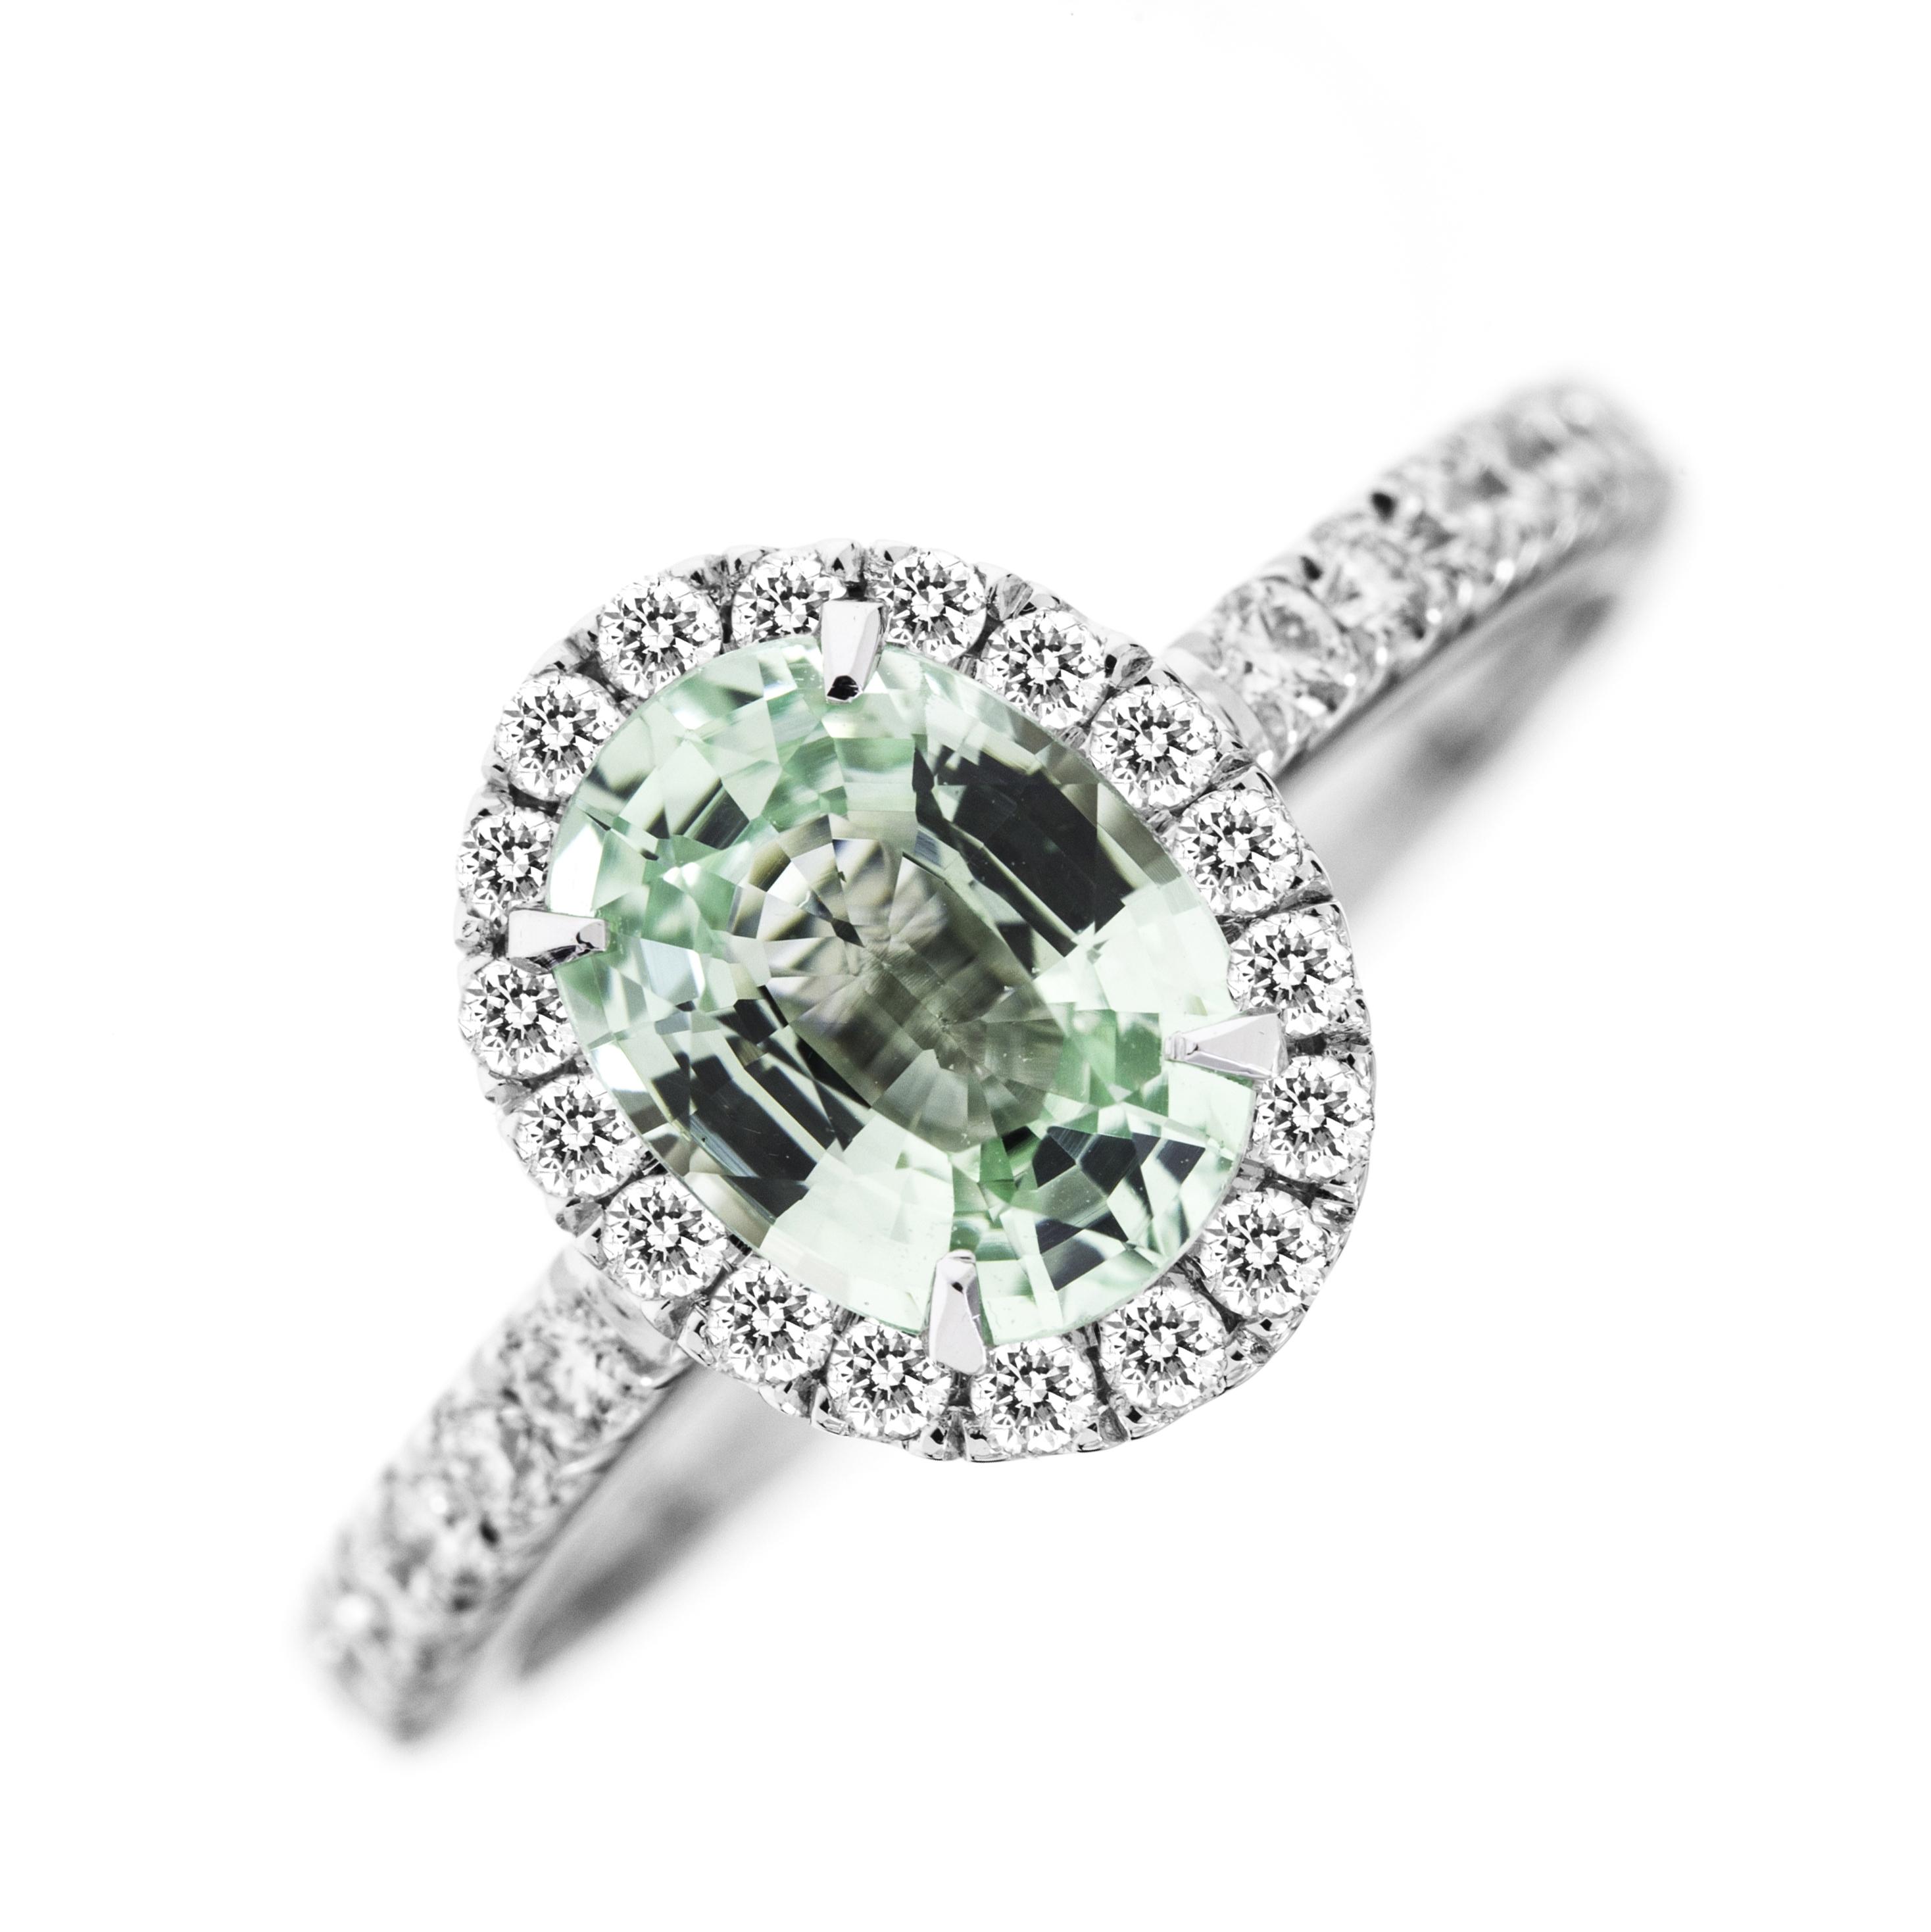 RDCH627W-Inel Chrysoberyl Verde si Diamante Dama Aur Alb 18kt,cu un Chrysoberyl Verde Oval si Diamante Rotunde-img1